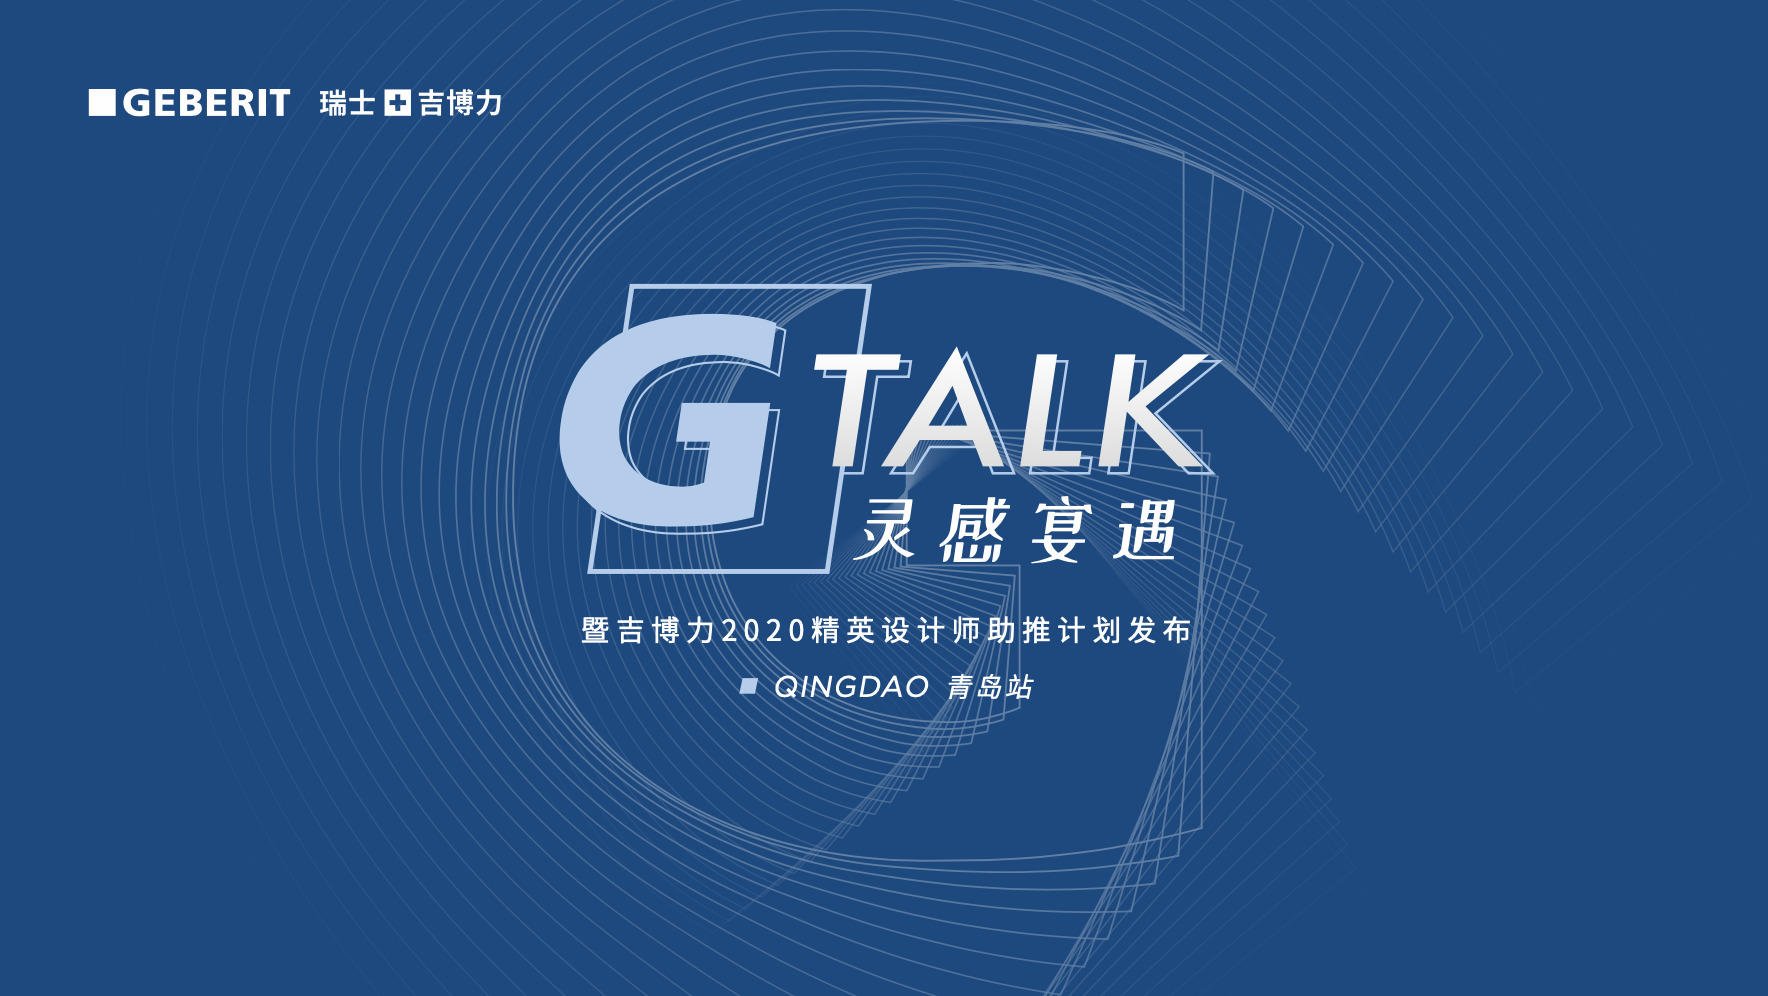 Geberit瑞士吉博力「G-TALK灵感宴遇」第四站|灵感碰撞,烟火青岛